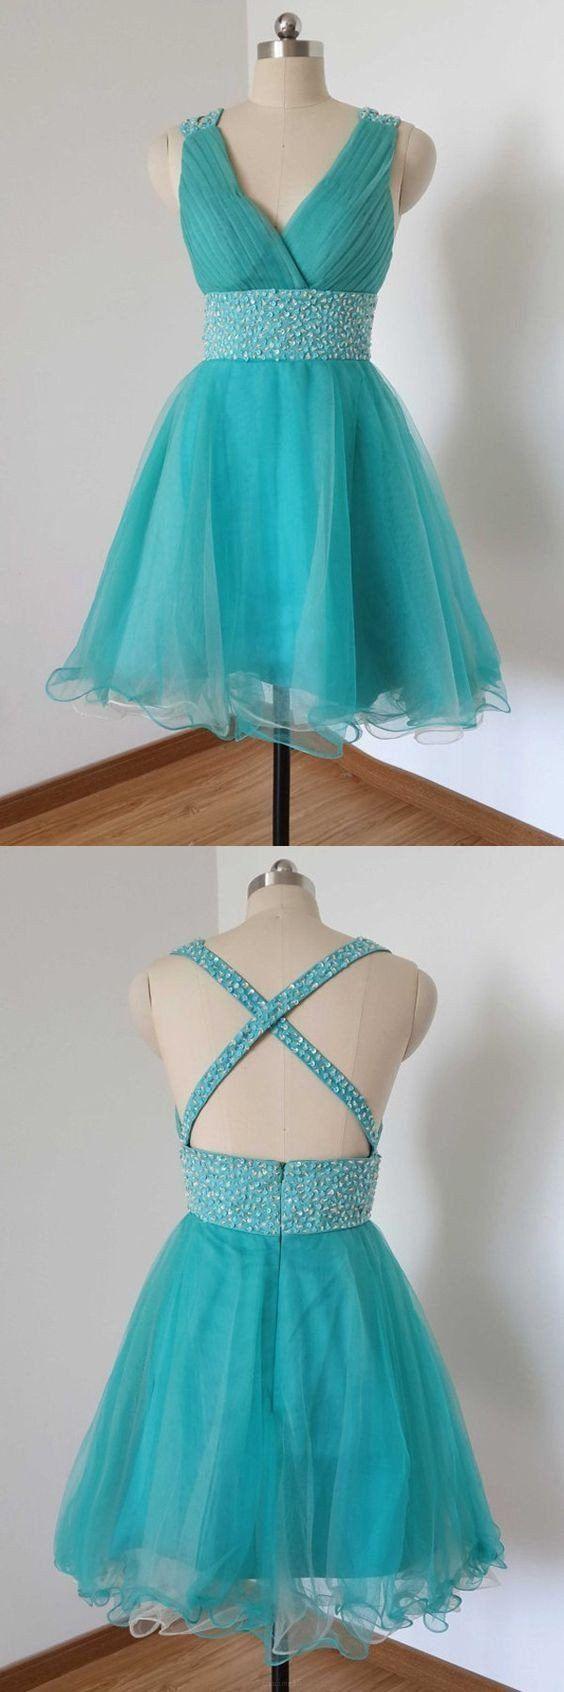 Cheap Mini Prom Homecoming Dress Short Light Blue Dresses With Criss